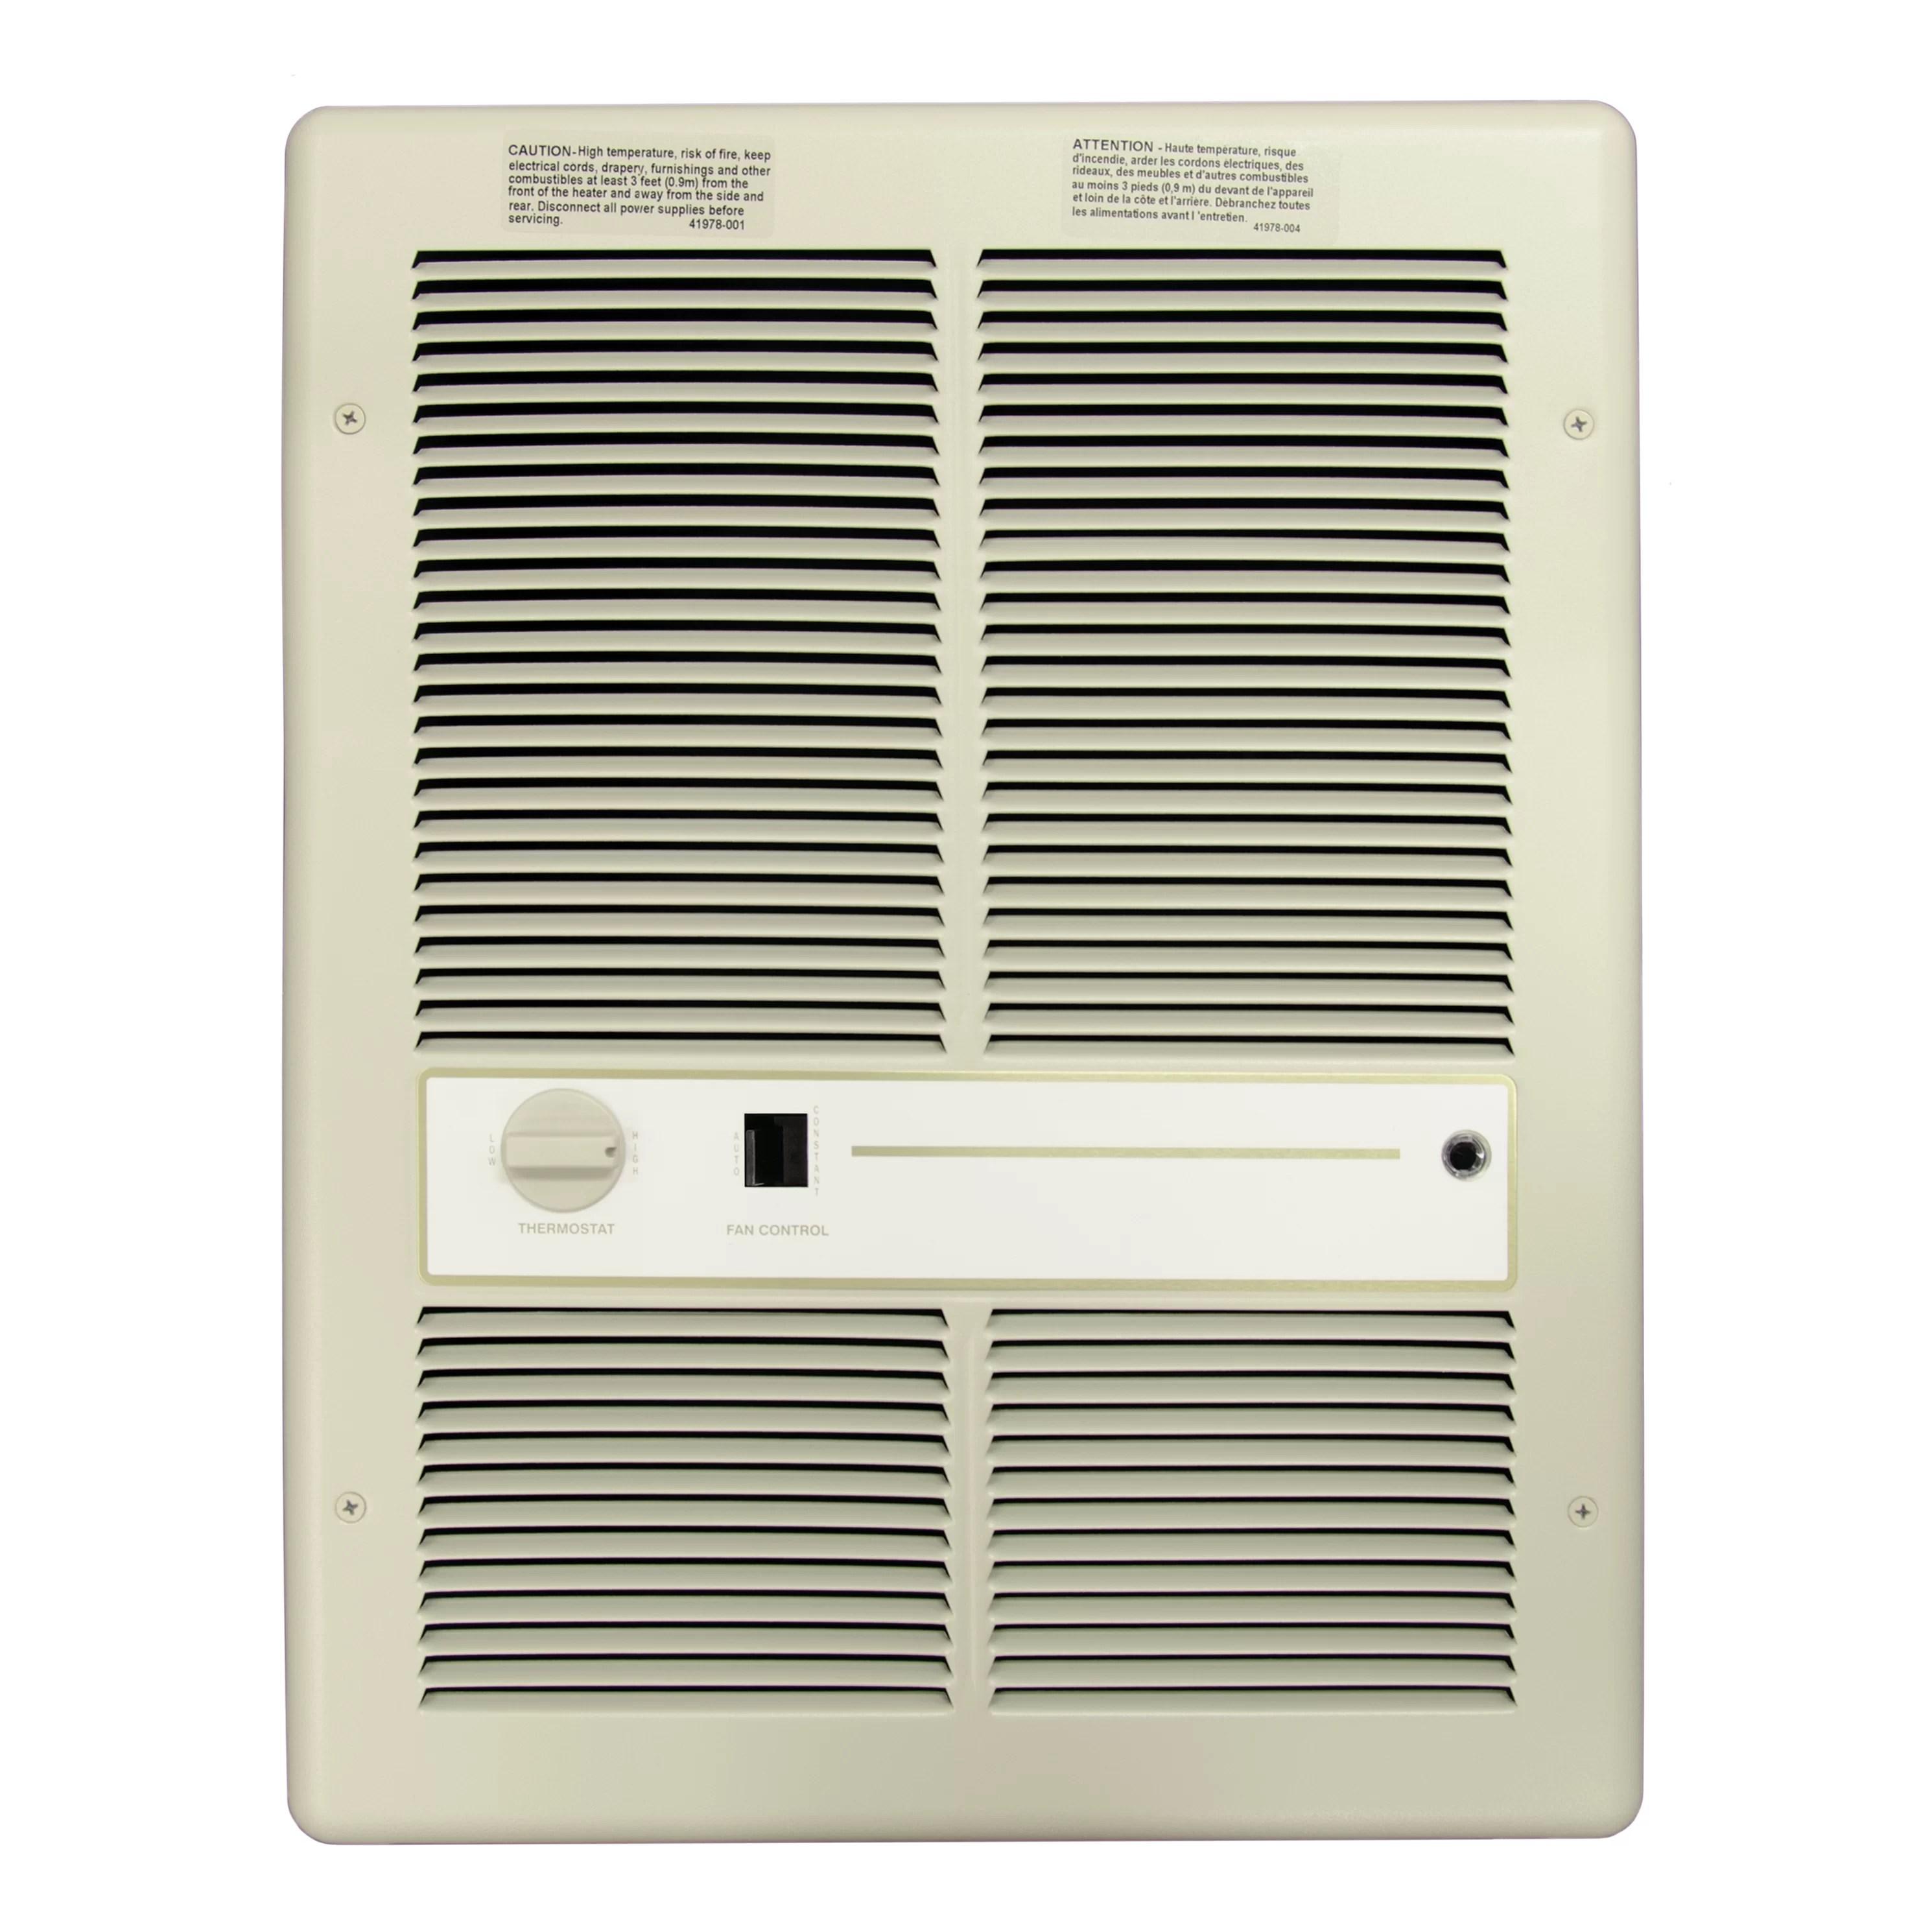 electric fan heaters jeep cj headlight wiring diagram tpi 4 000 watt wall insert heater with summer